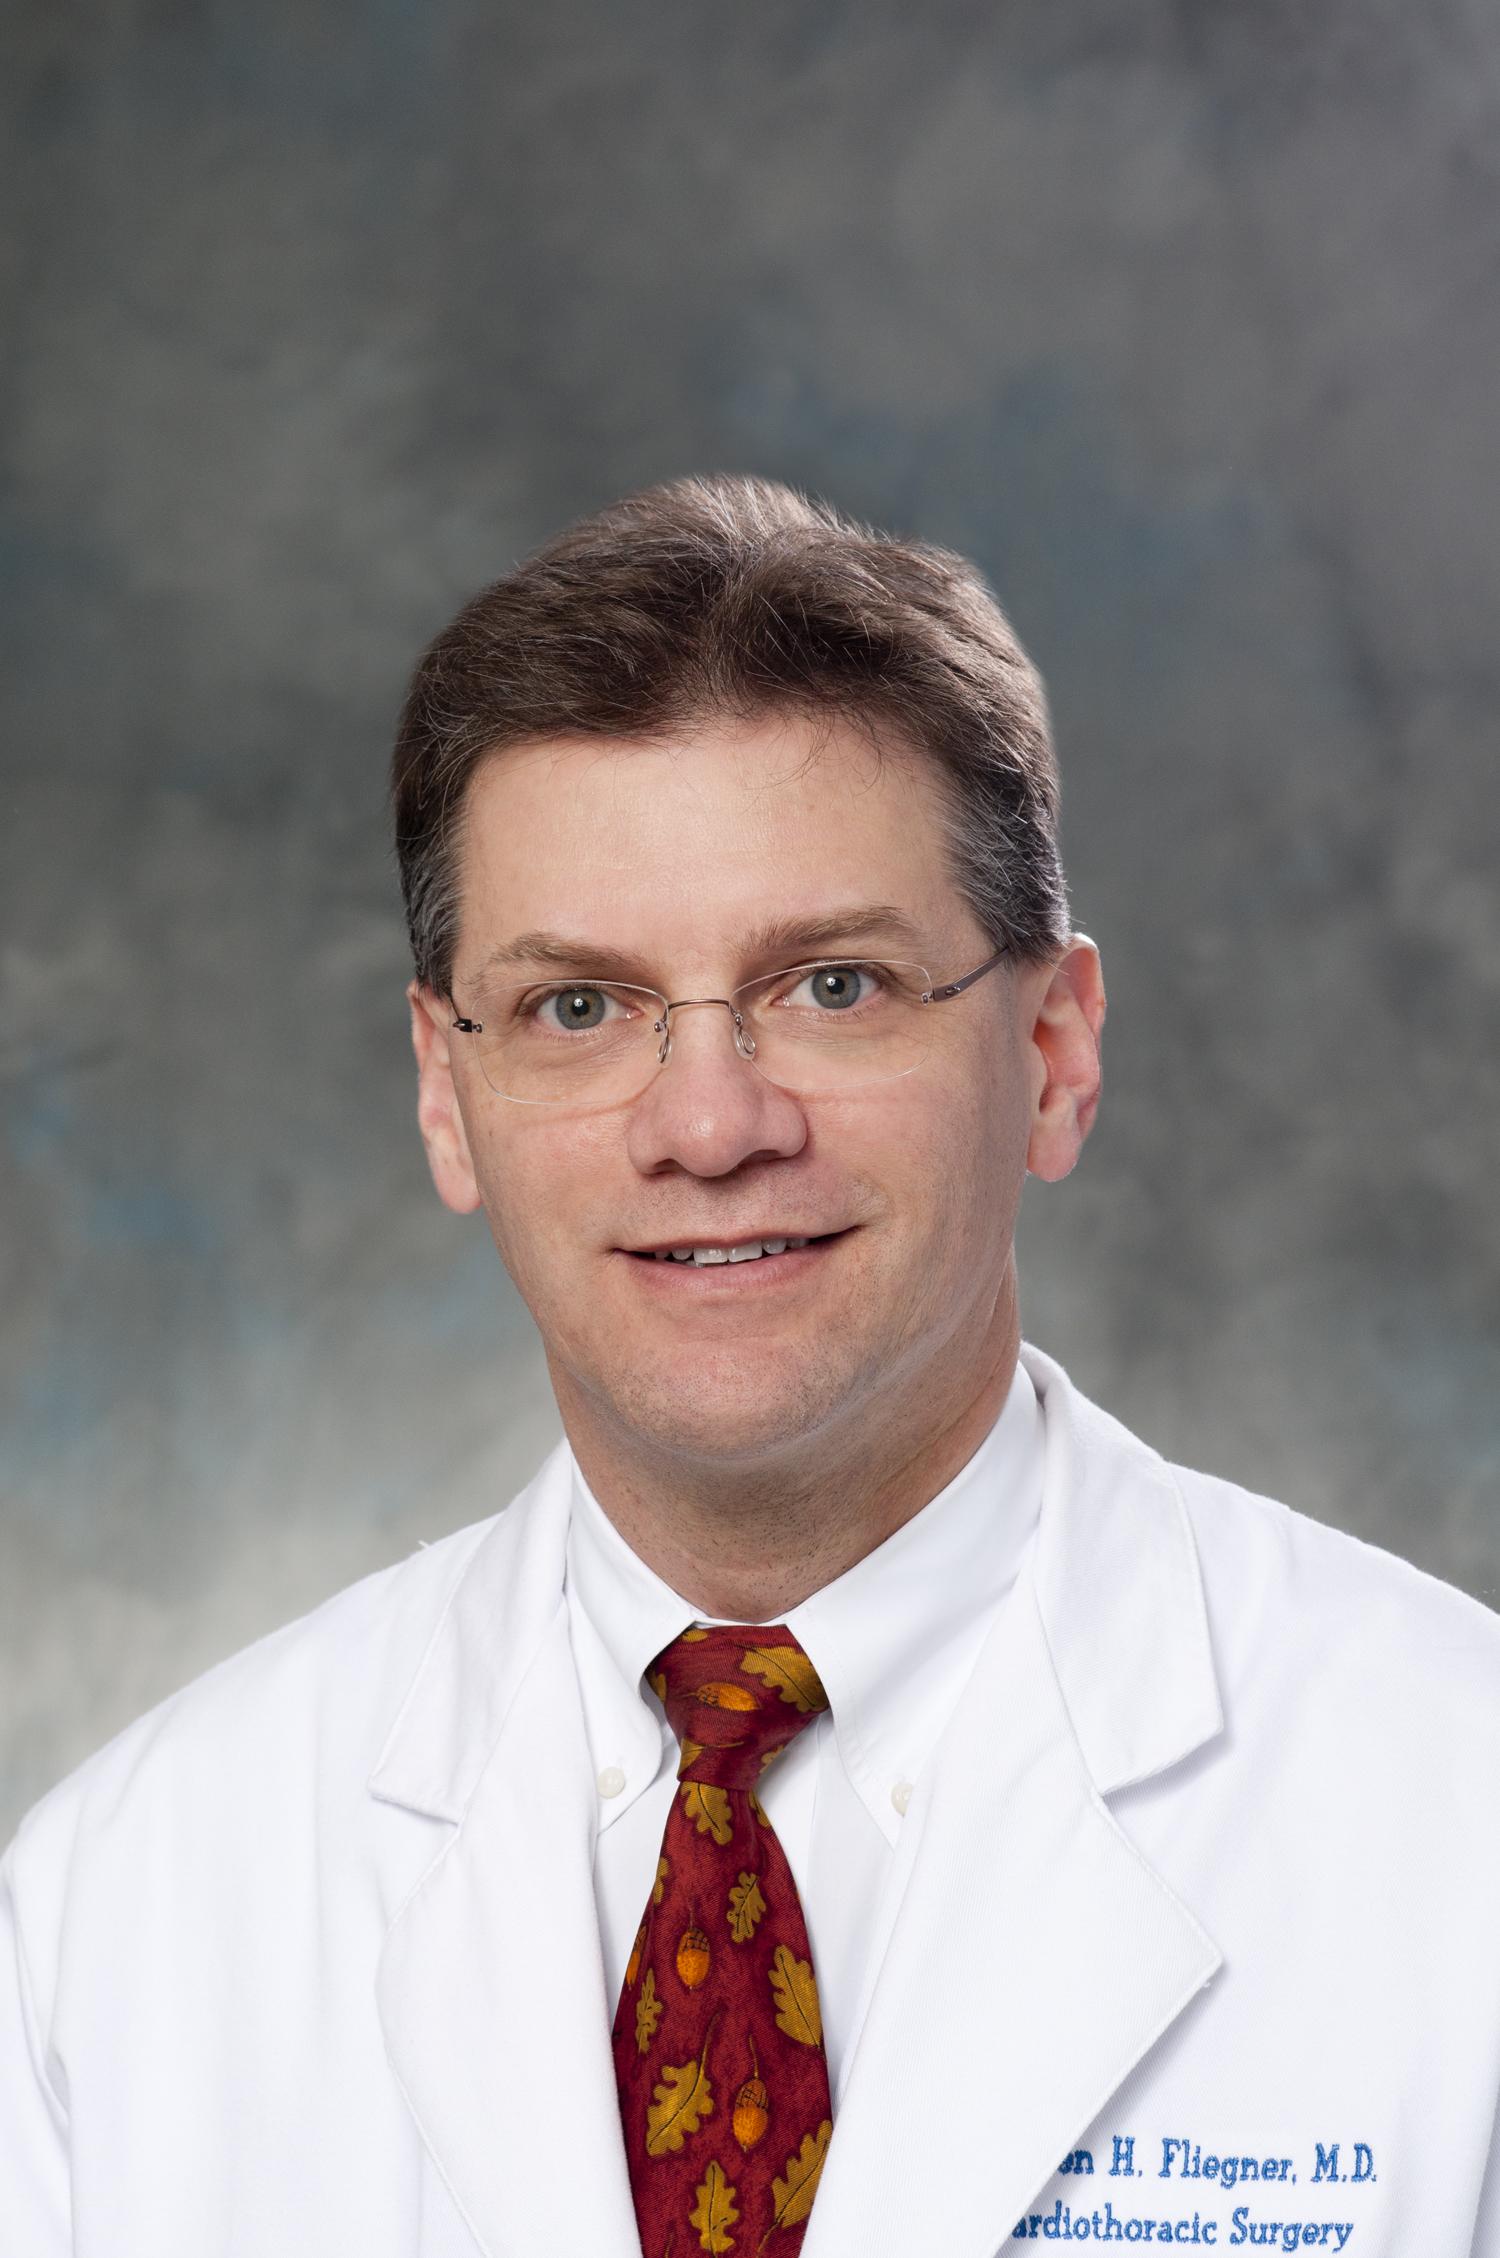 Karsten Fliegner, MD